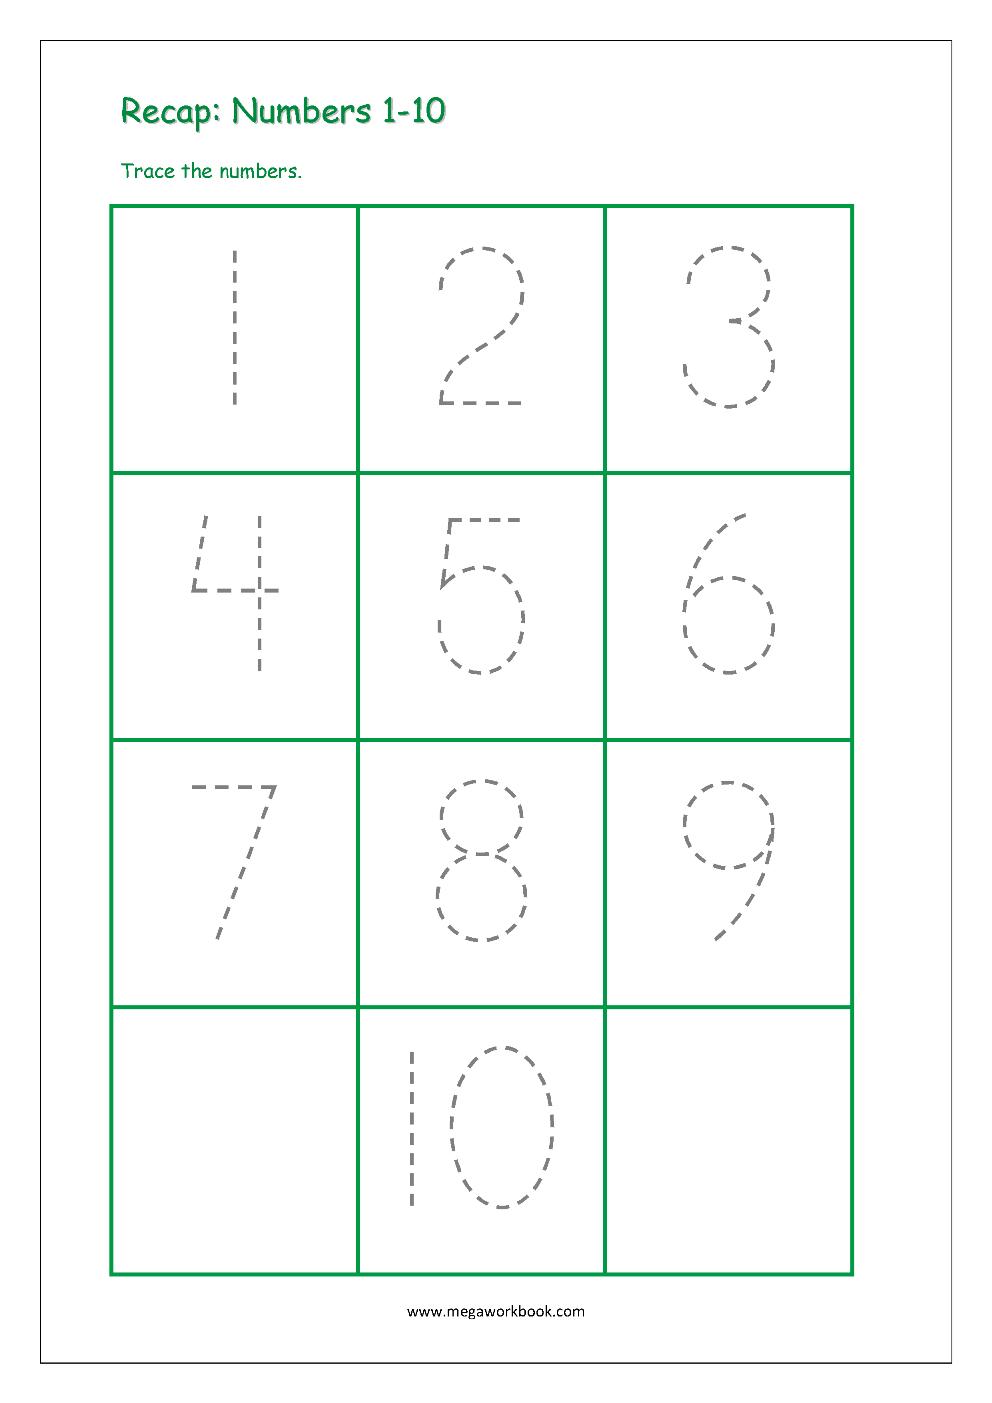 Number Tracing - Tracing Numbers - Number Tracing Worksheets ...